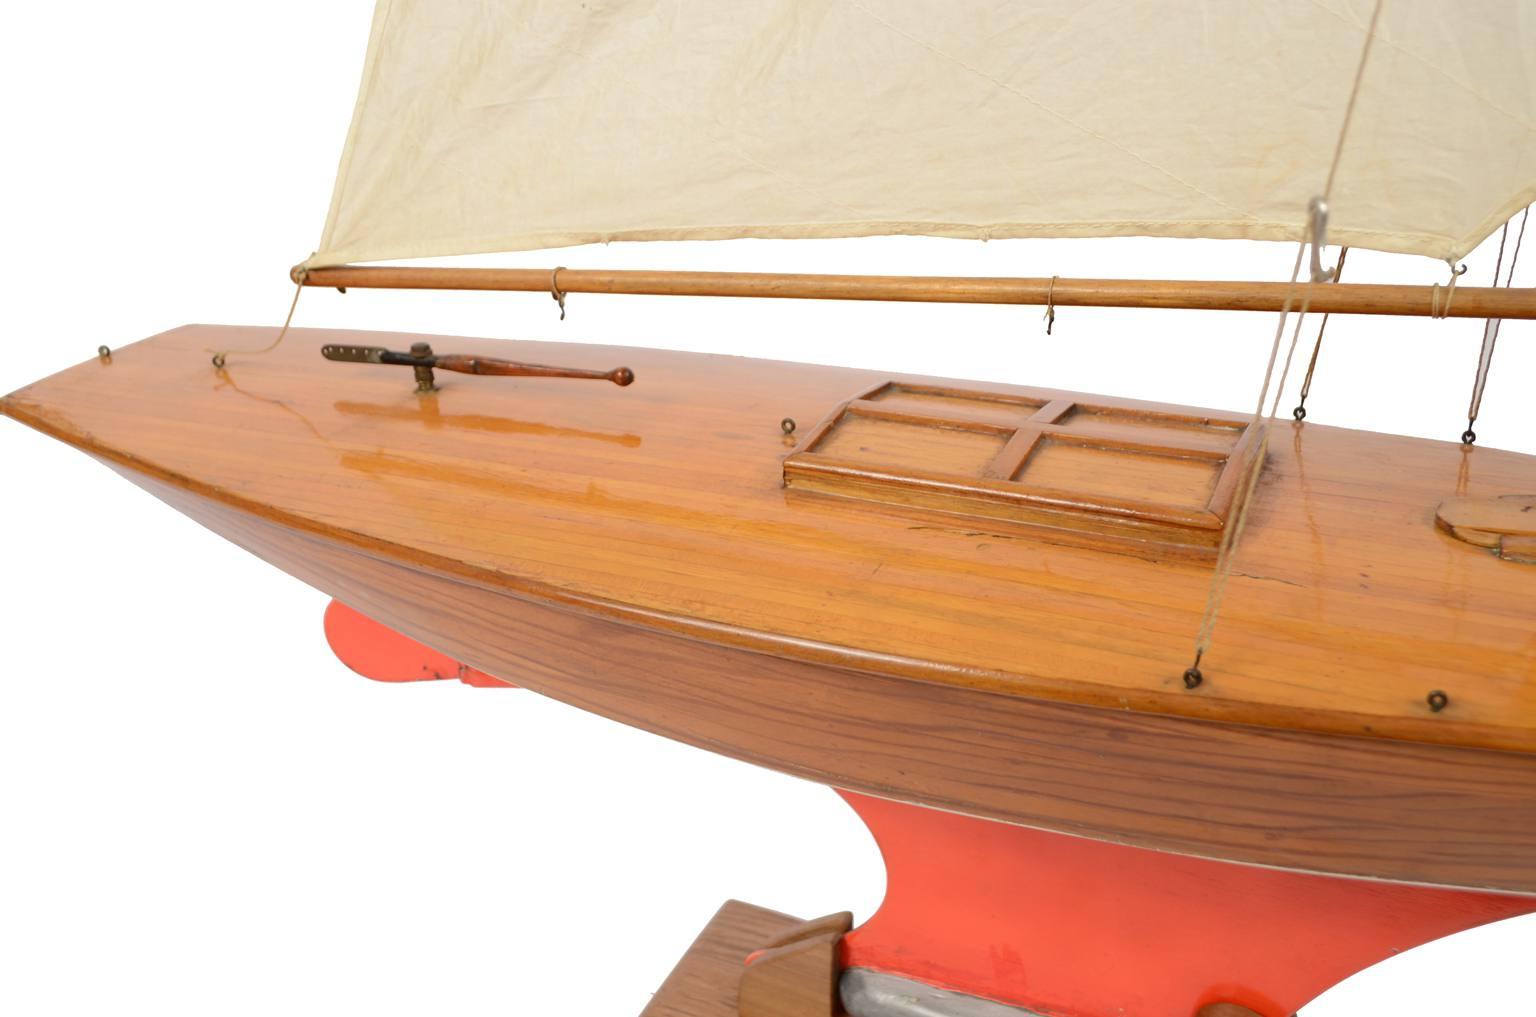 Modelli di navi d'epoca/5021B-Pond model